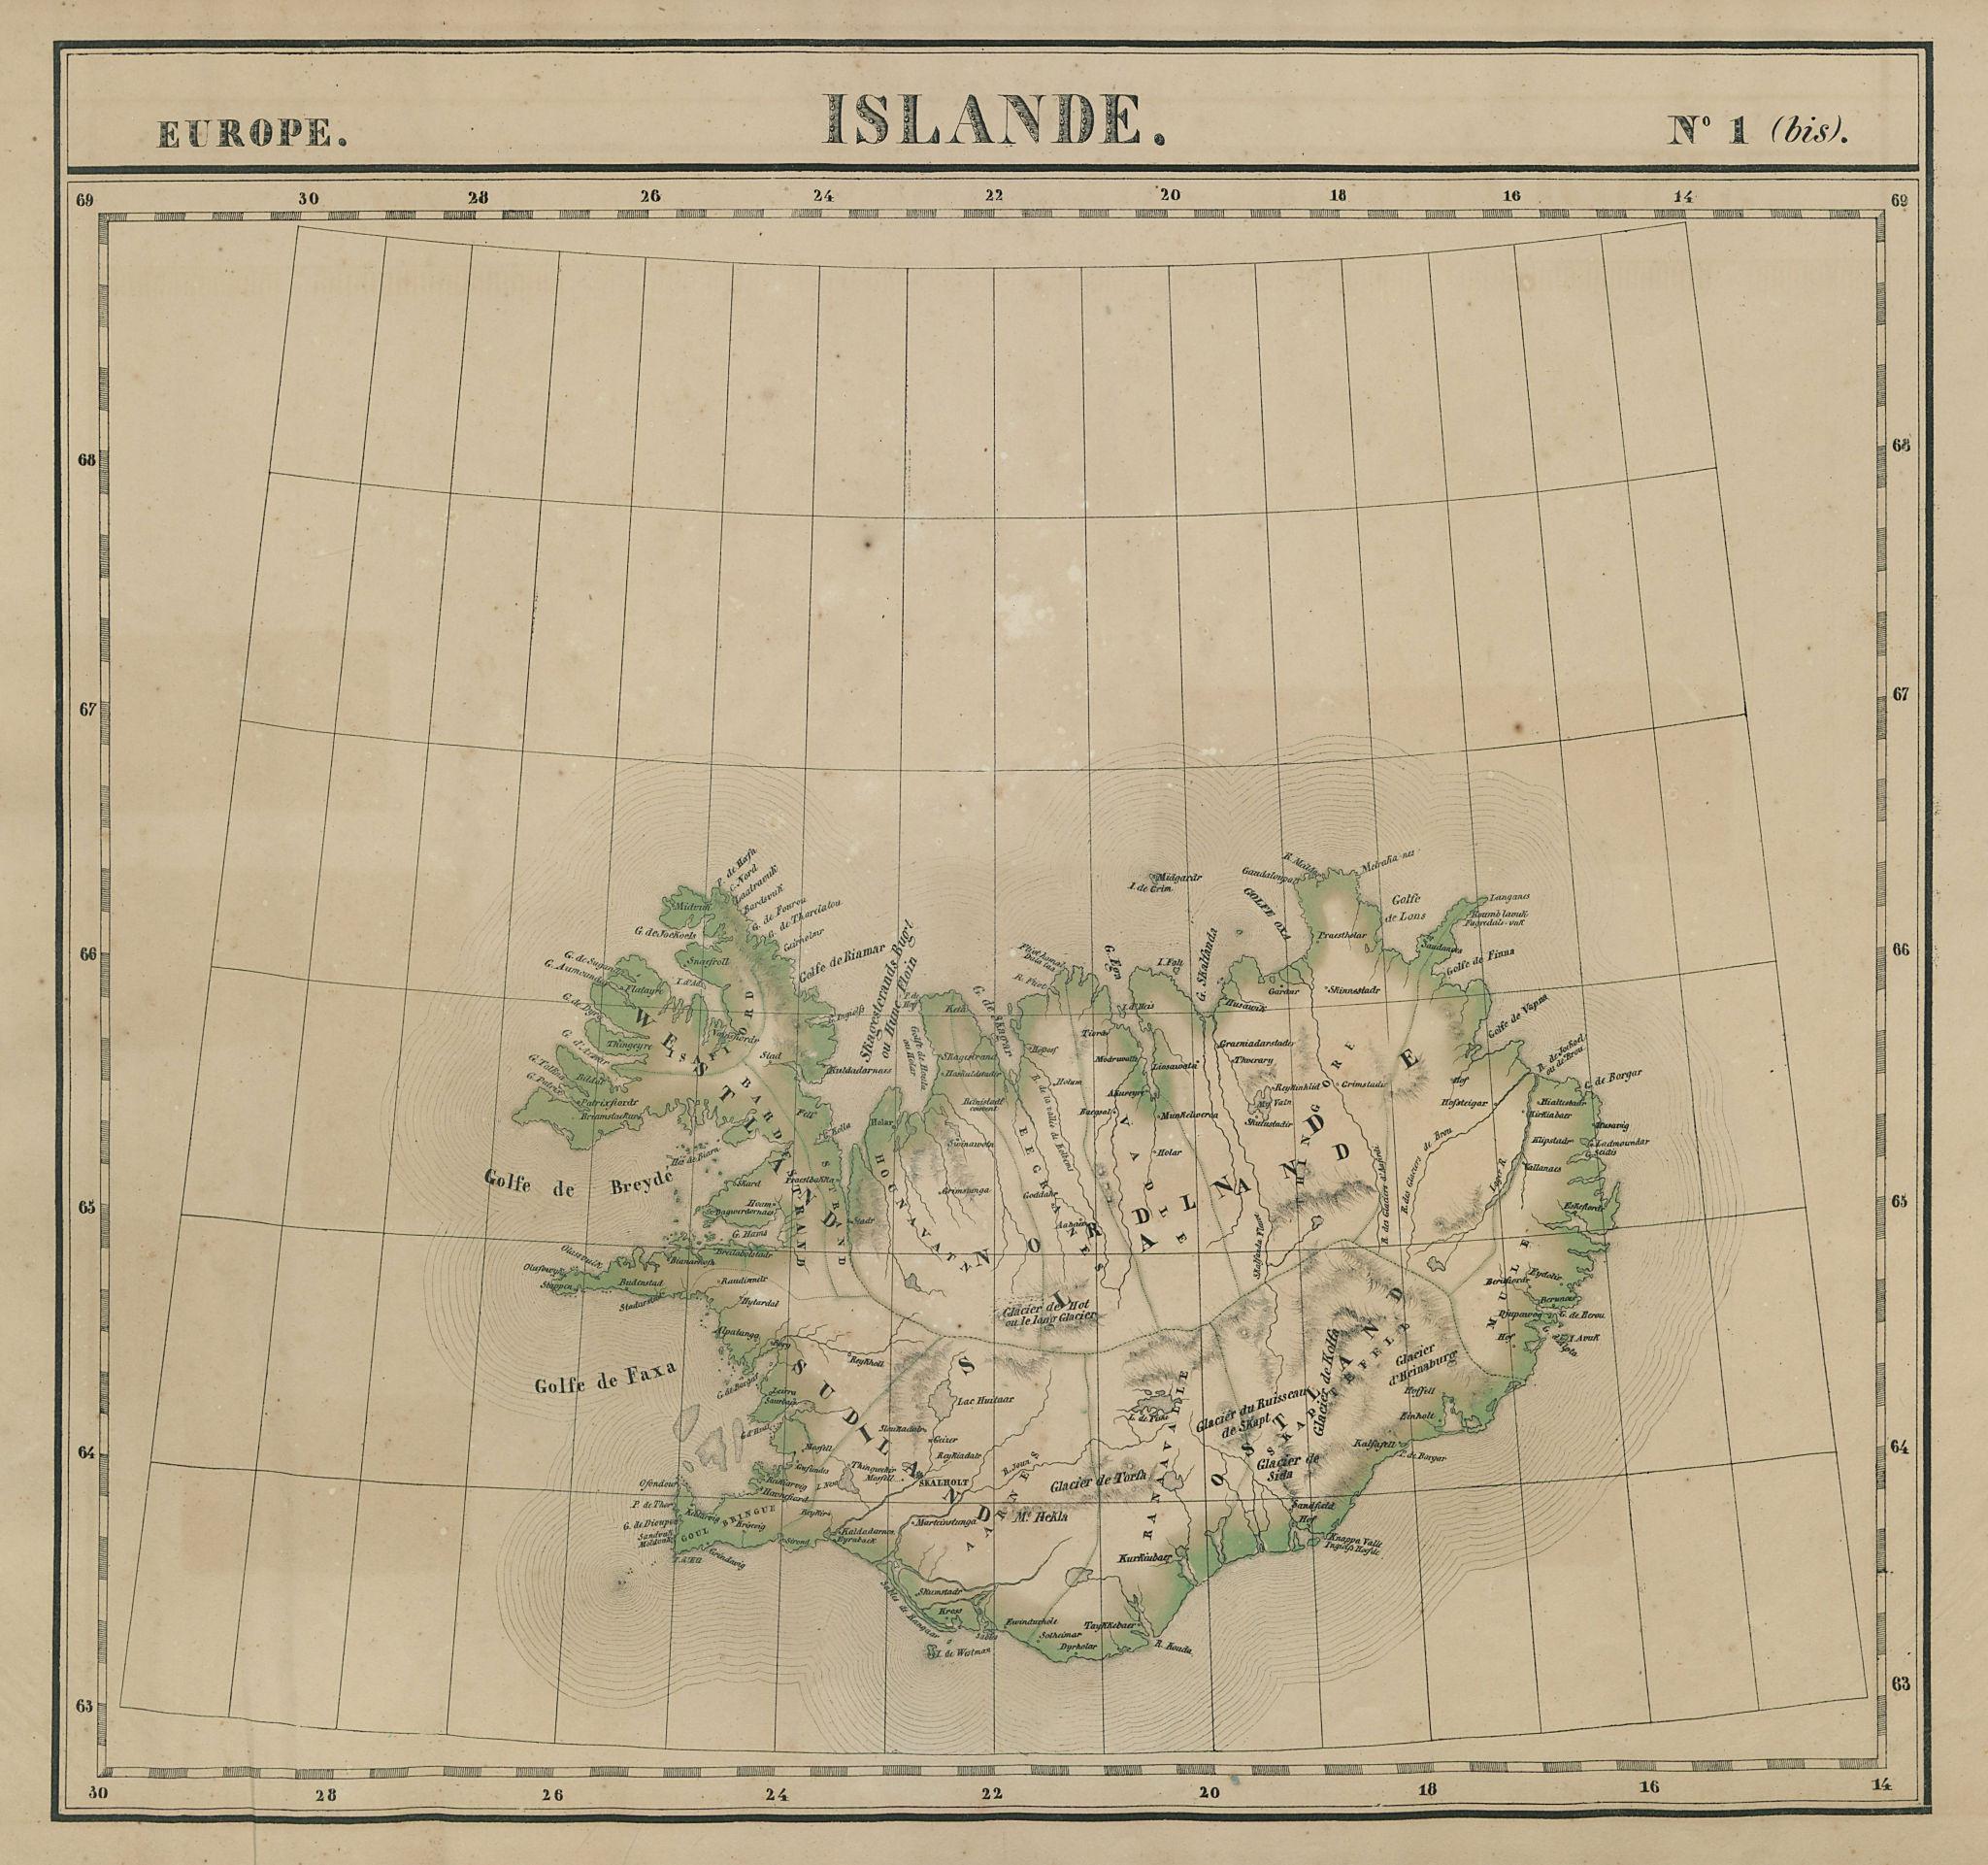 Europe. Islande #1 (bis) Iceland. VANDERMAELEN 1827 old antique map plan chart